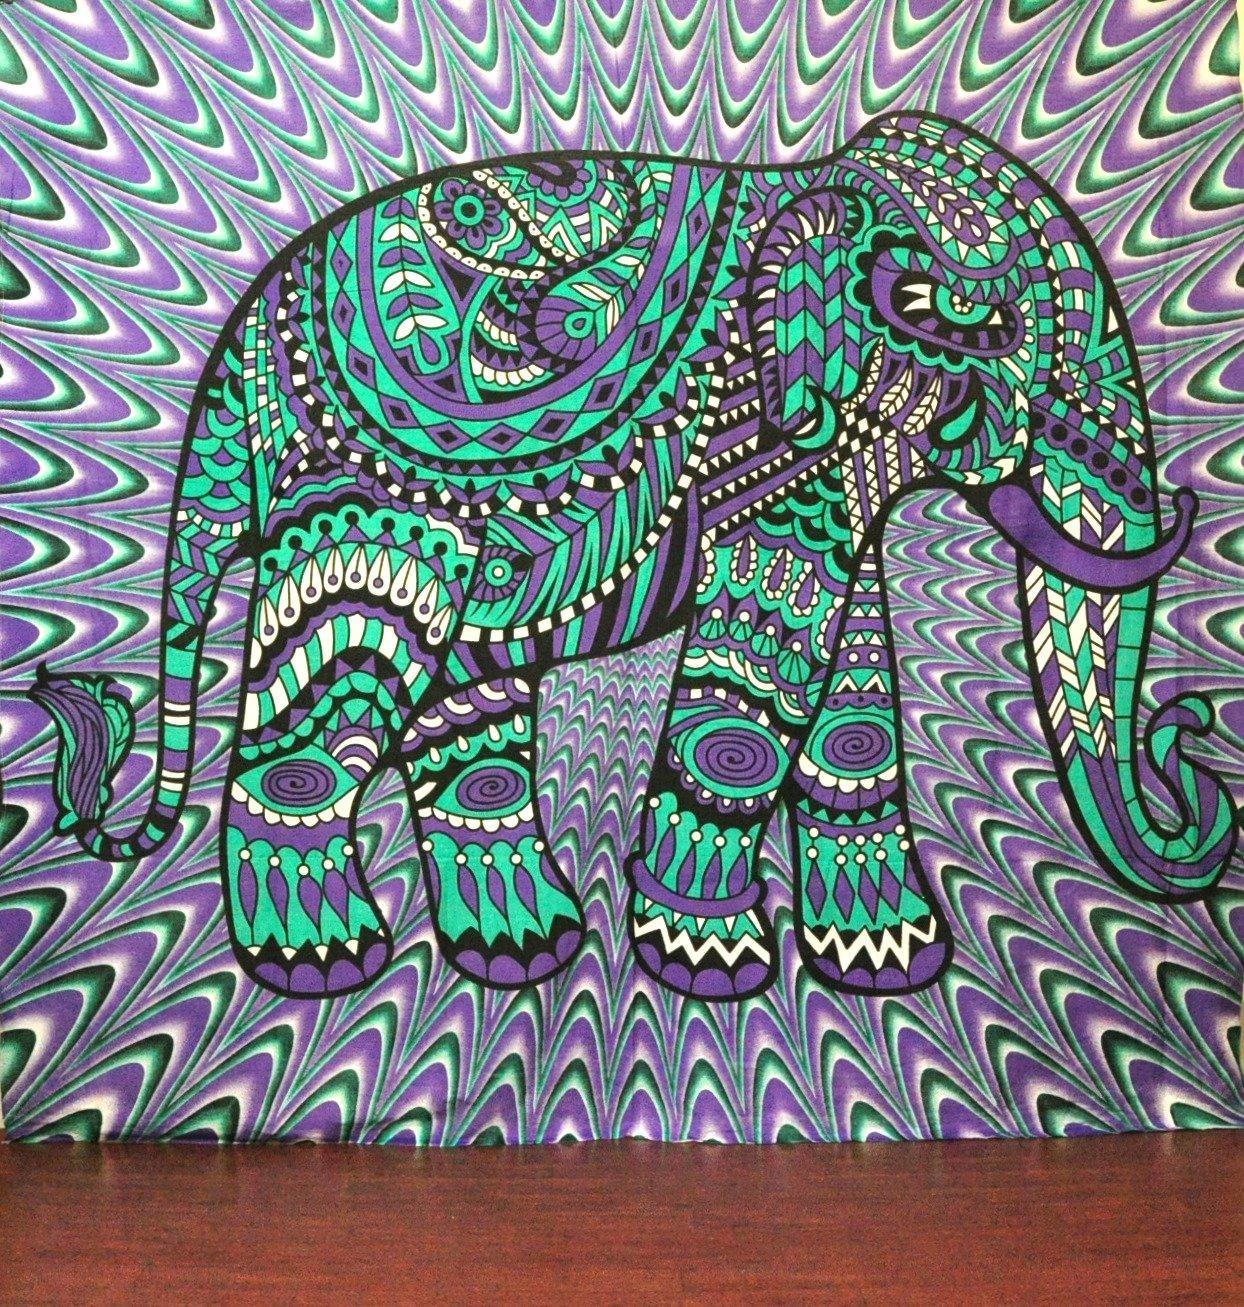 Amazon.com: Psychedelic Elephant Tapestry Trippy Colorful Mandala ...